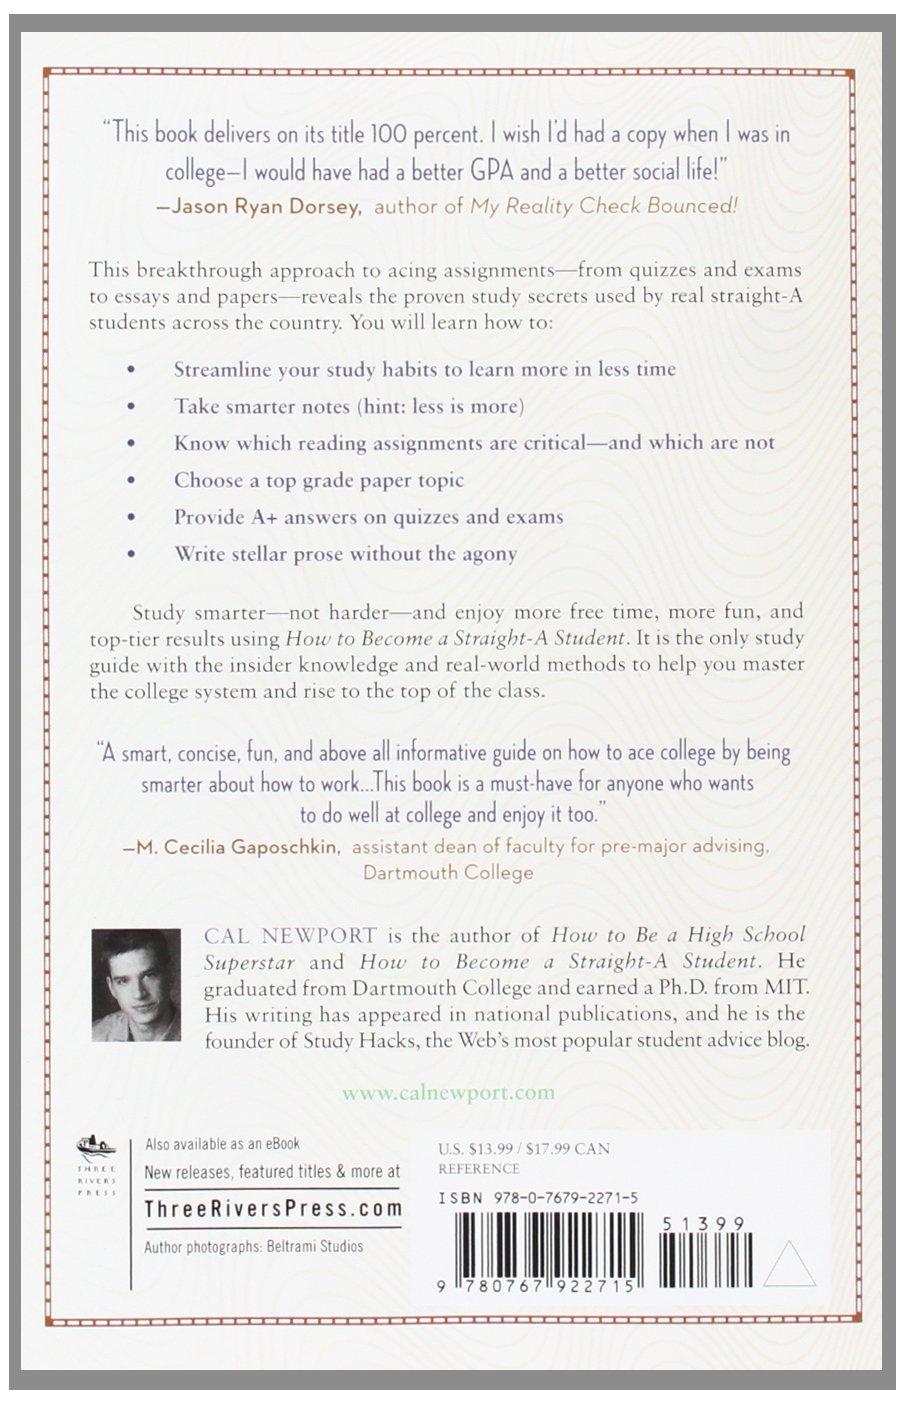 School - Homework Help - The Batavia Public Library top school paper